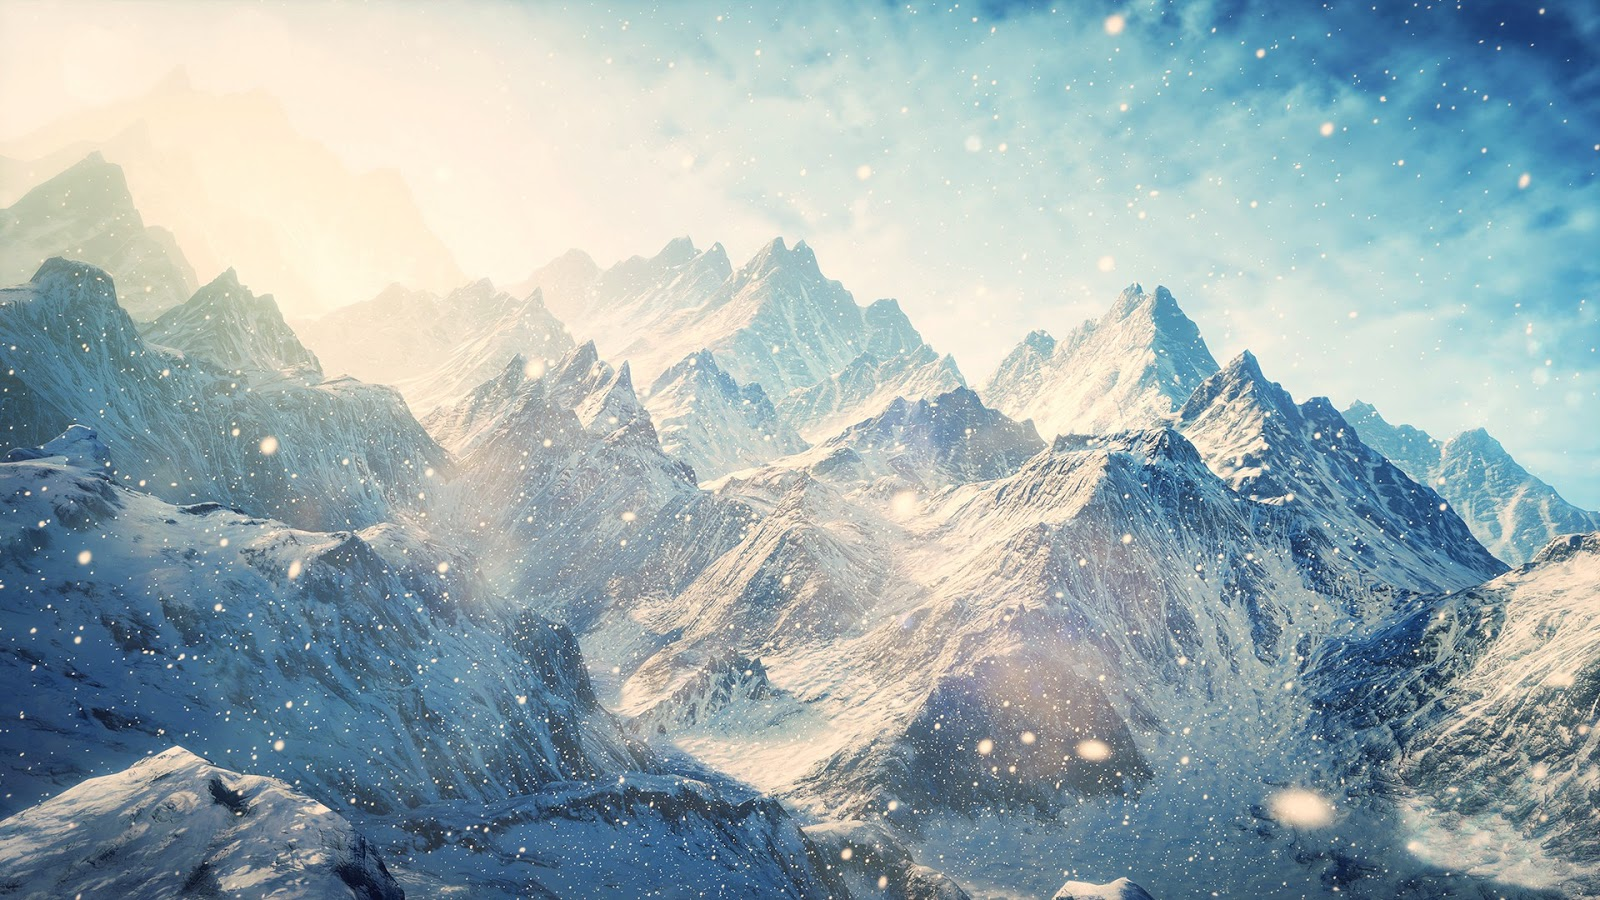 Fondo De Pantalla Paisaje Montañas Nevada: Imagenes Hilandy: Fondo De Pantalla Paisajes Montañas Nevadas